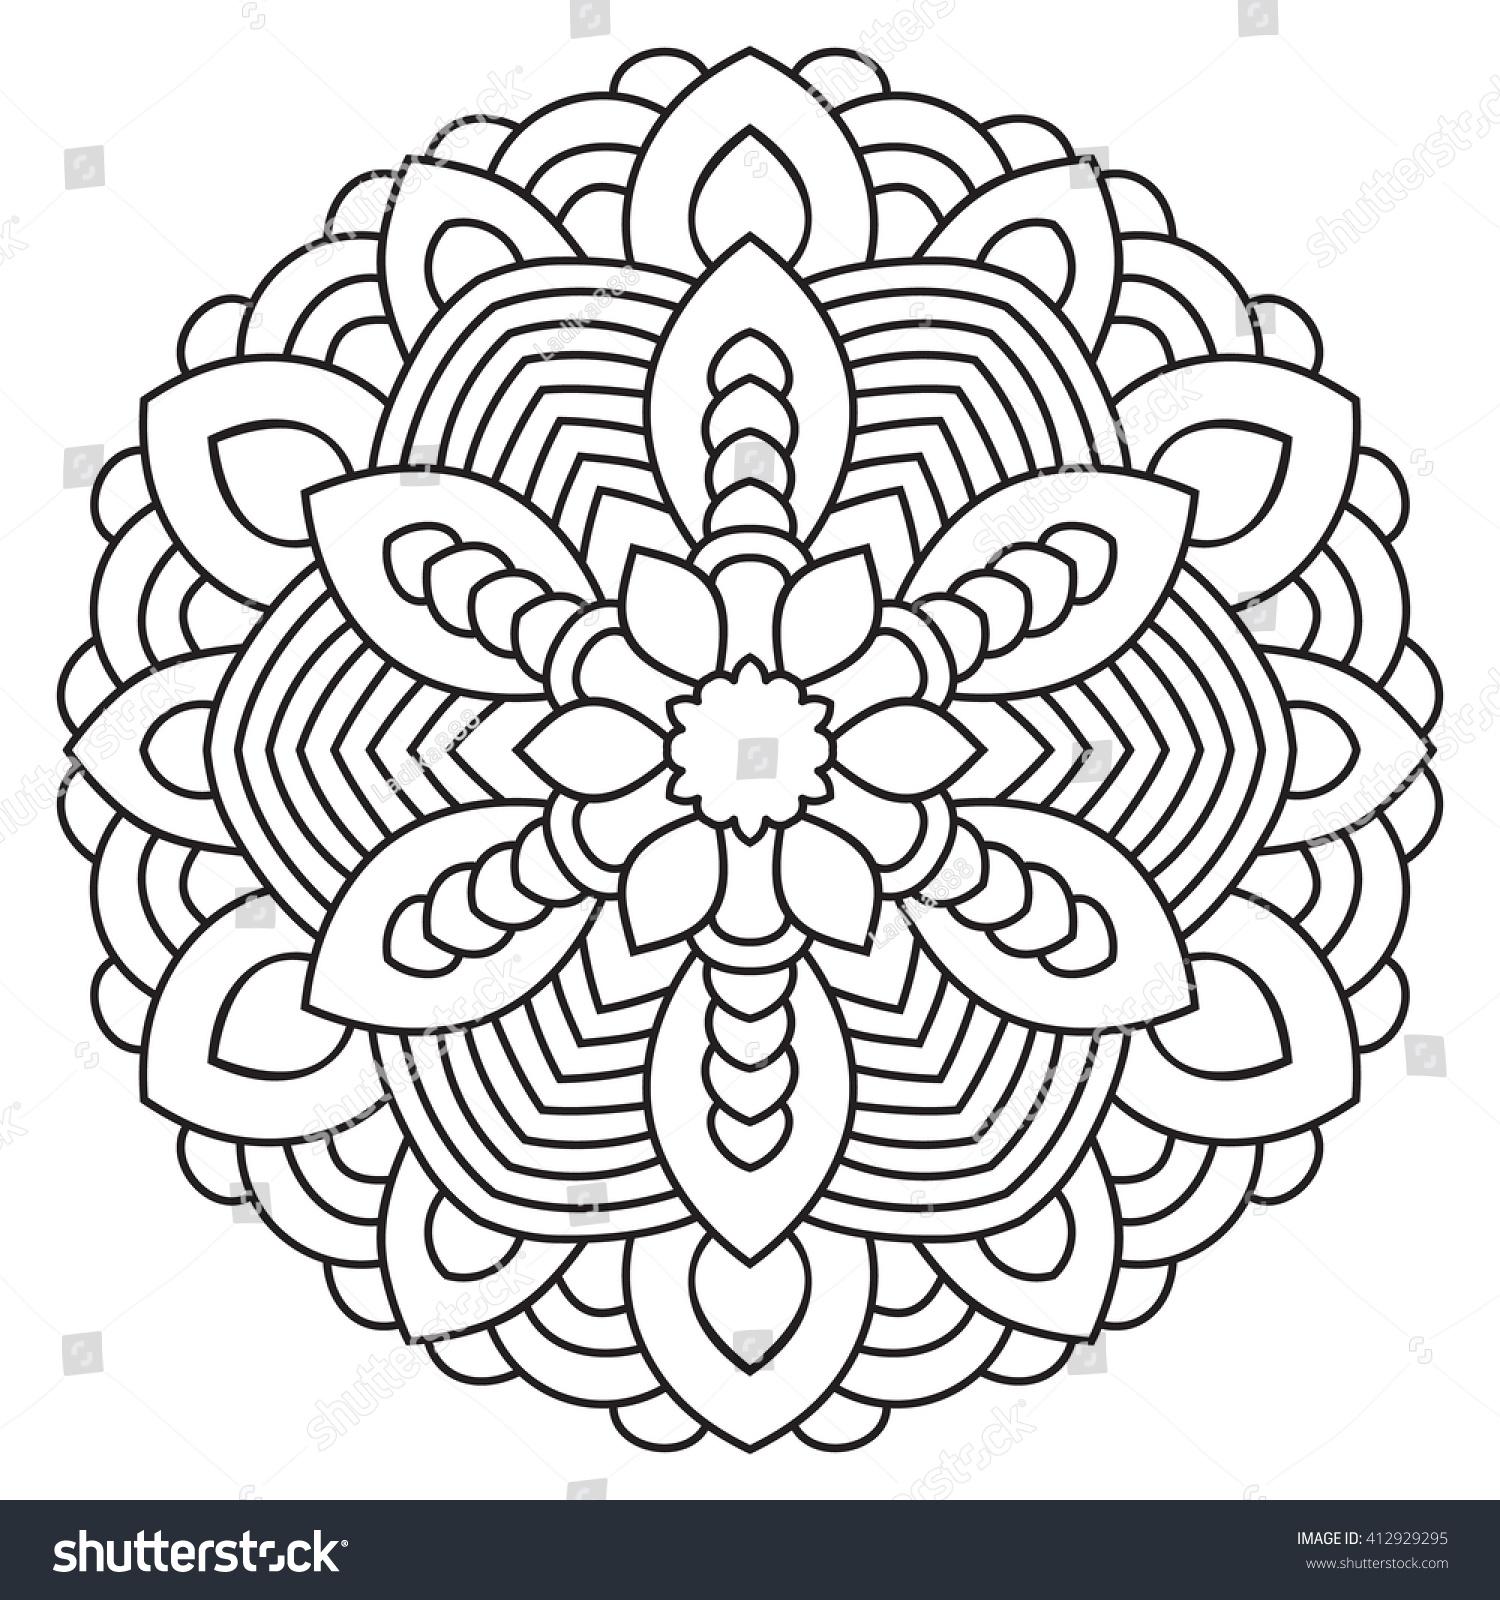 symmetrical coloring pages - symmetrical circular pattern mandala oriental ornament